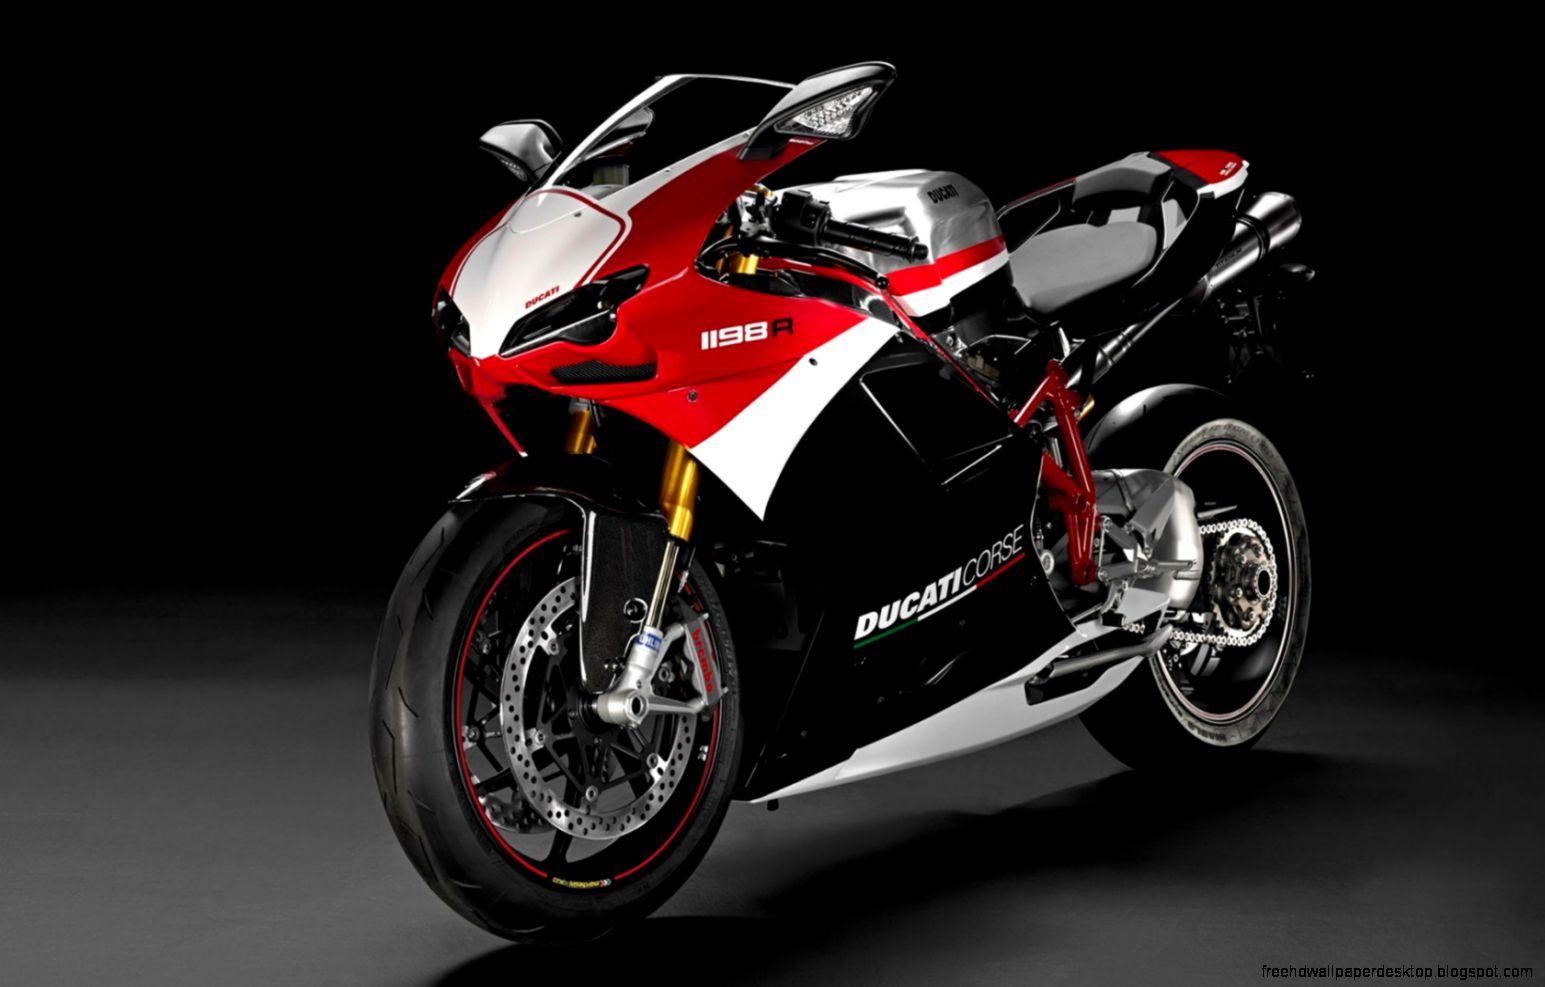 Ducati Superbike 1198 R Corse  Wallpapers Design